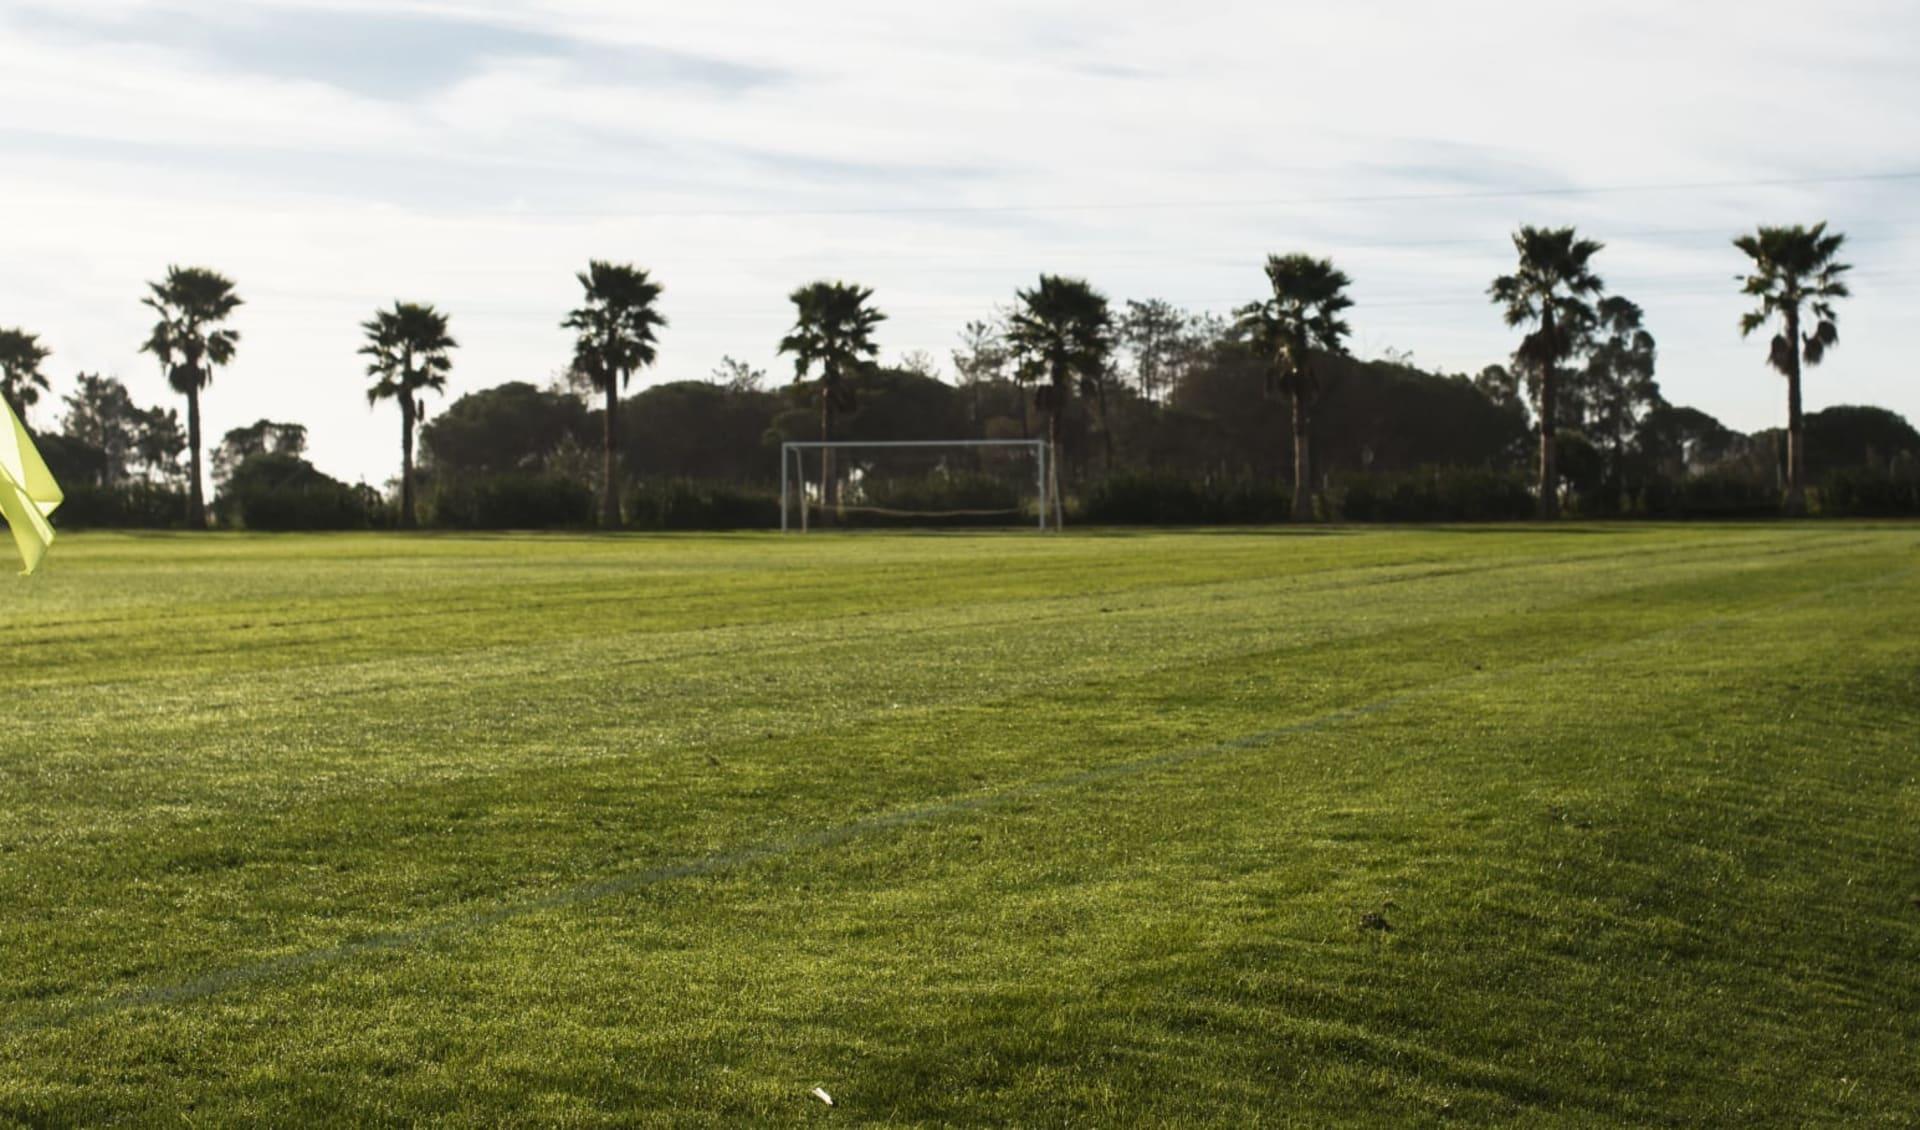 Islantilla - Islantilla Golf Resort ab Malaga: A3_Campo de Futbol